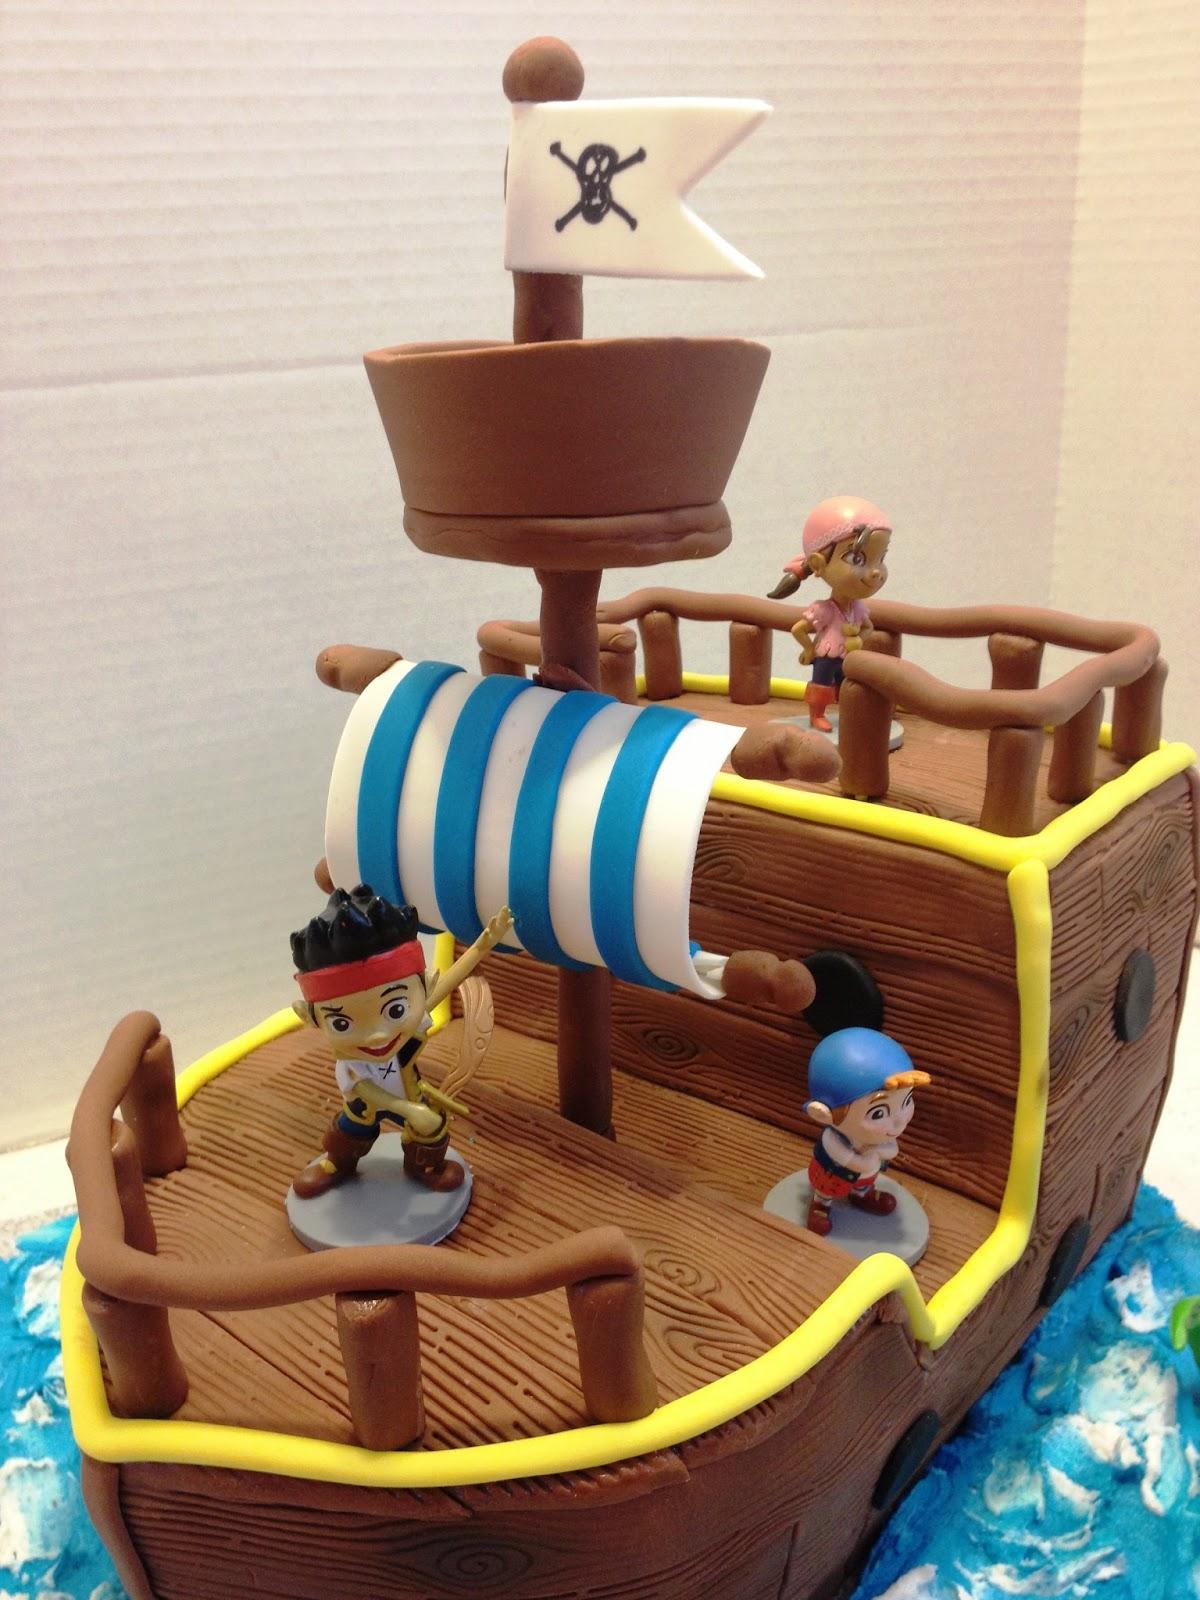 jake and the neverland pirates cake - photo #29